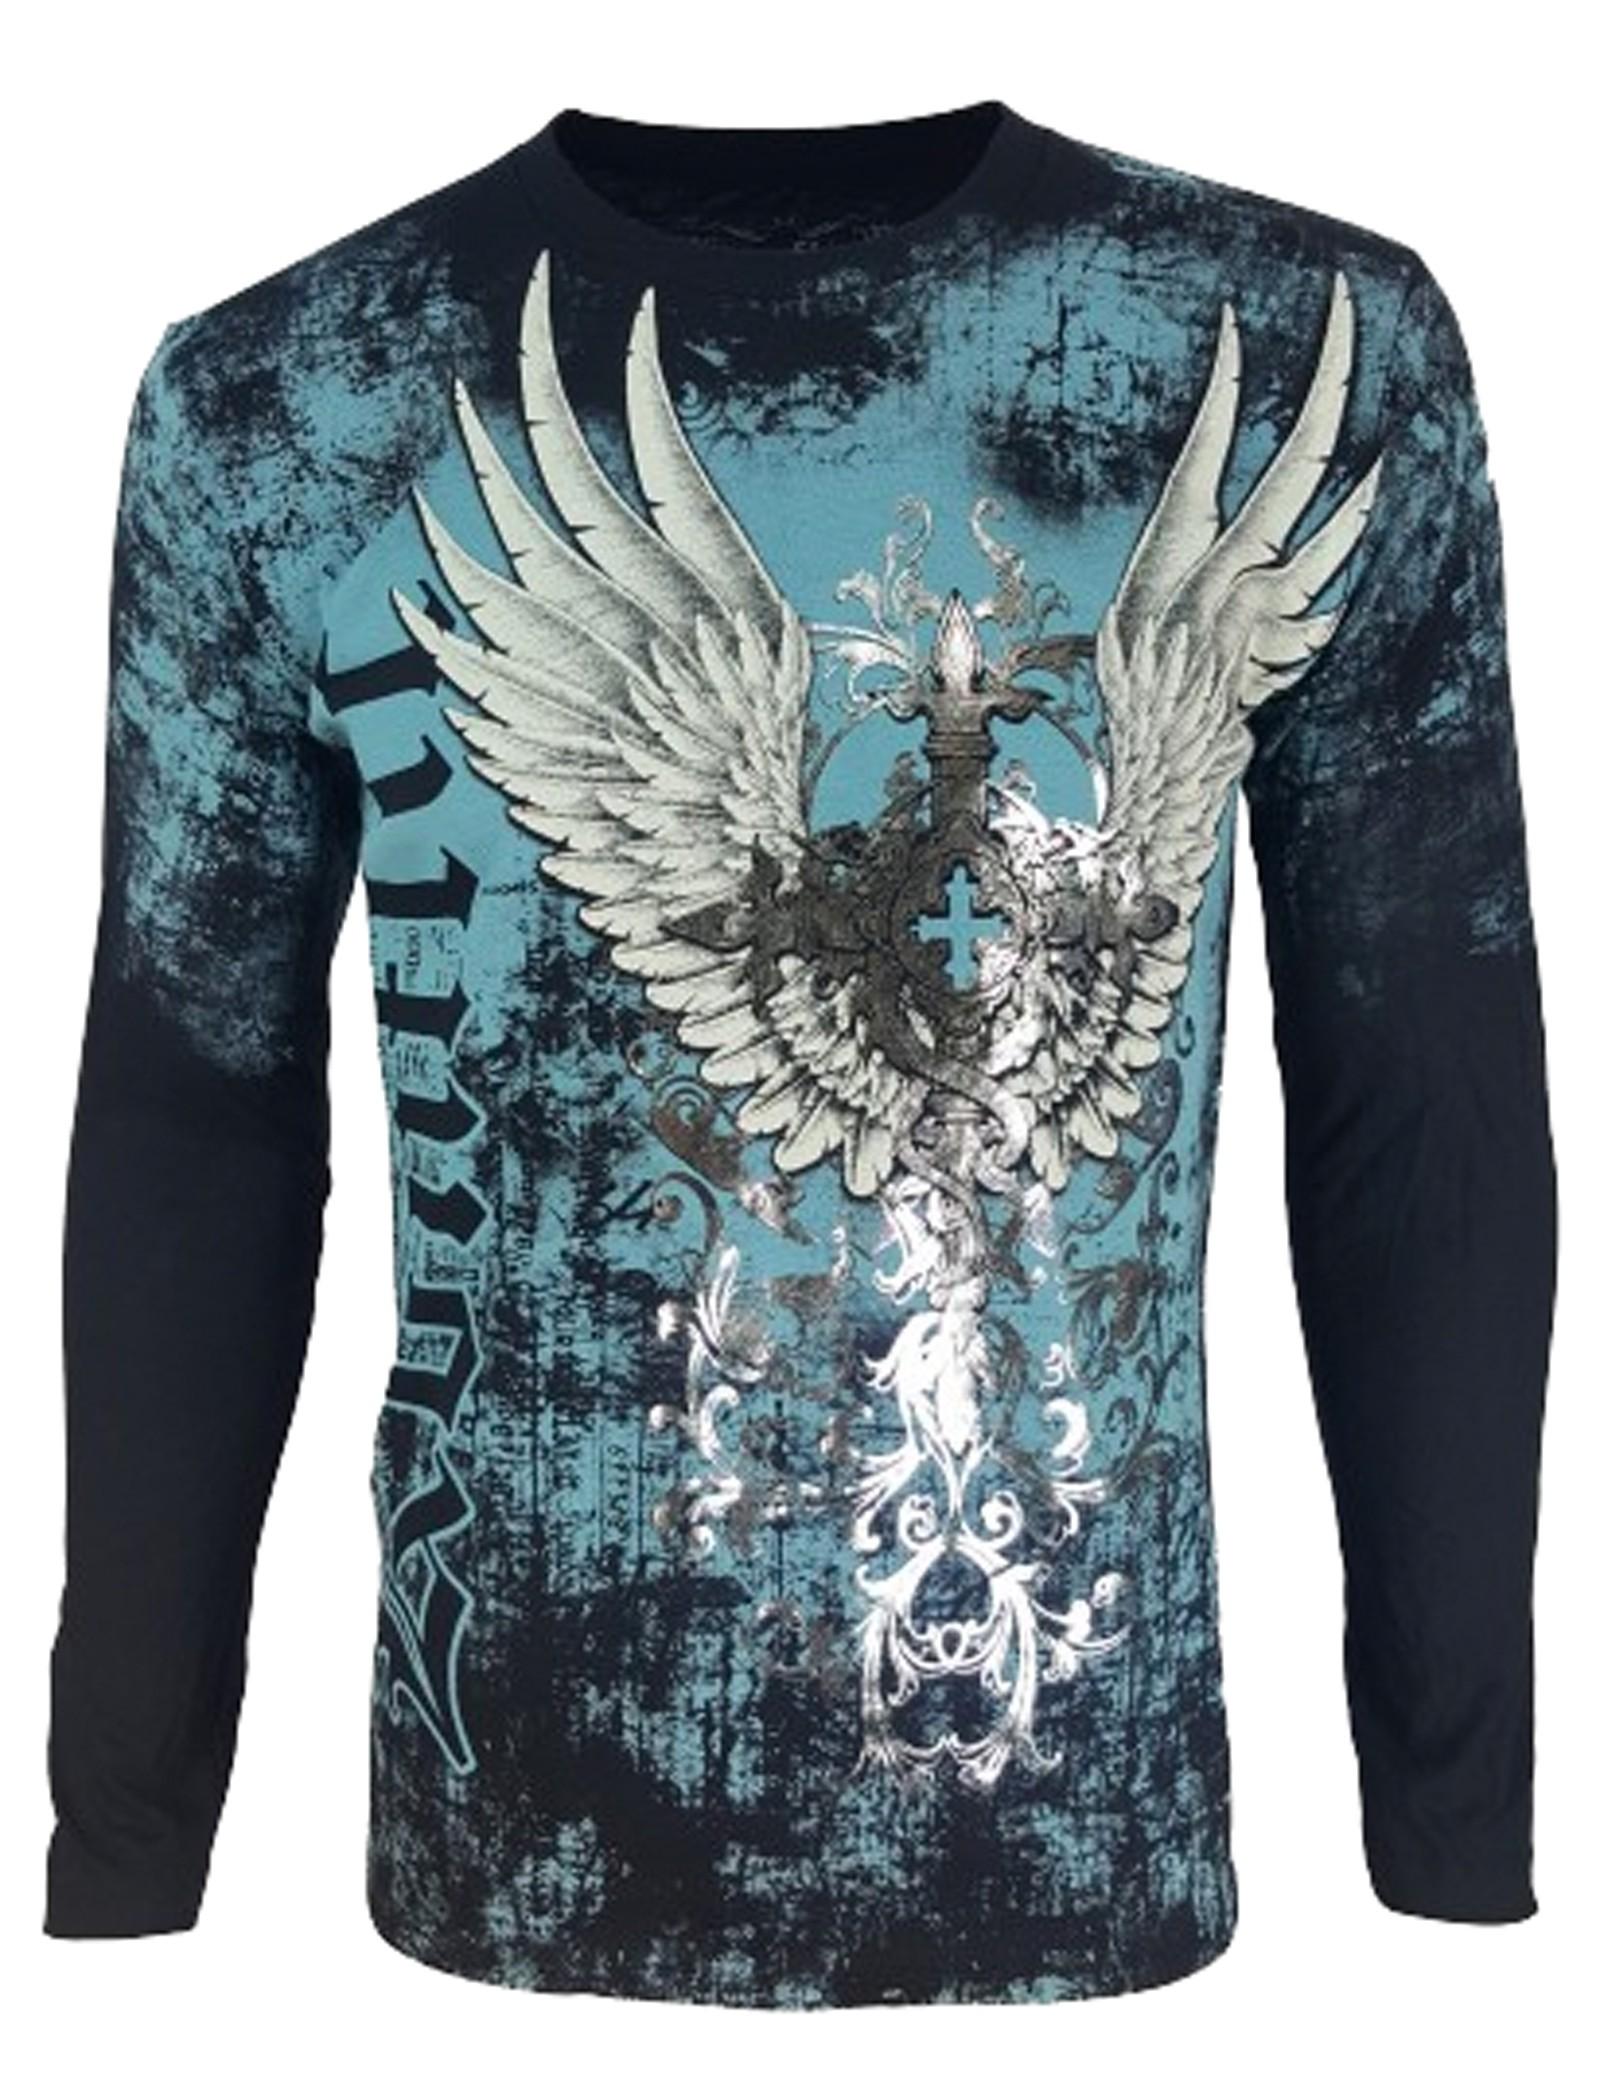 Konflic Clothing - No Regrets Longsleeve T-Shirt